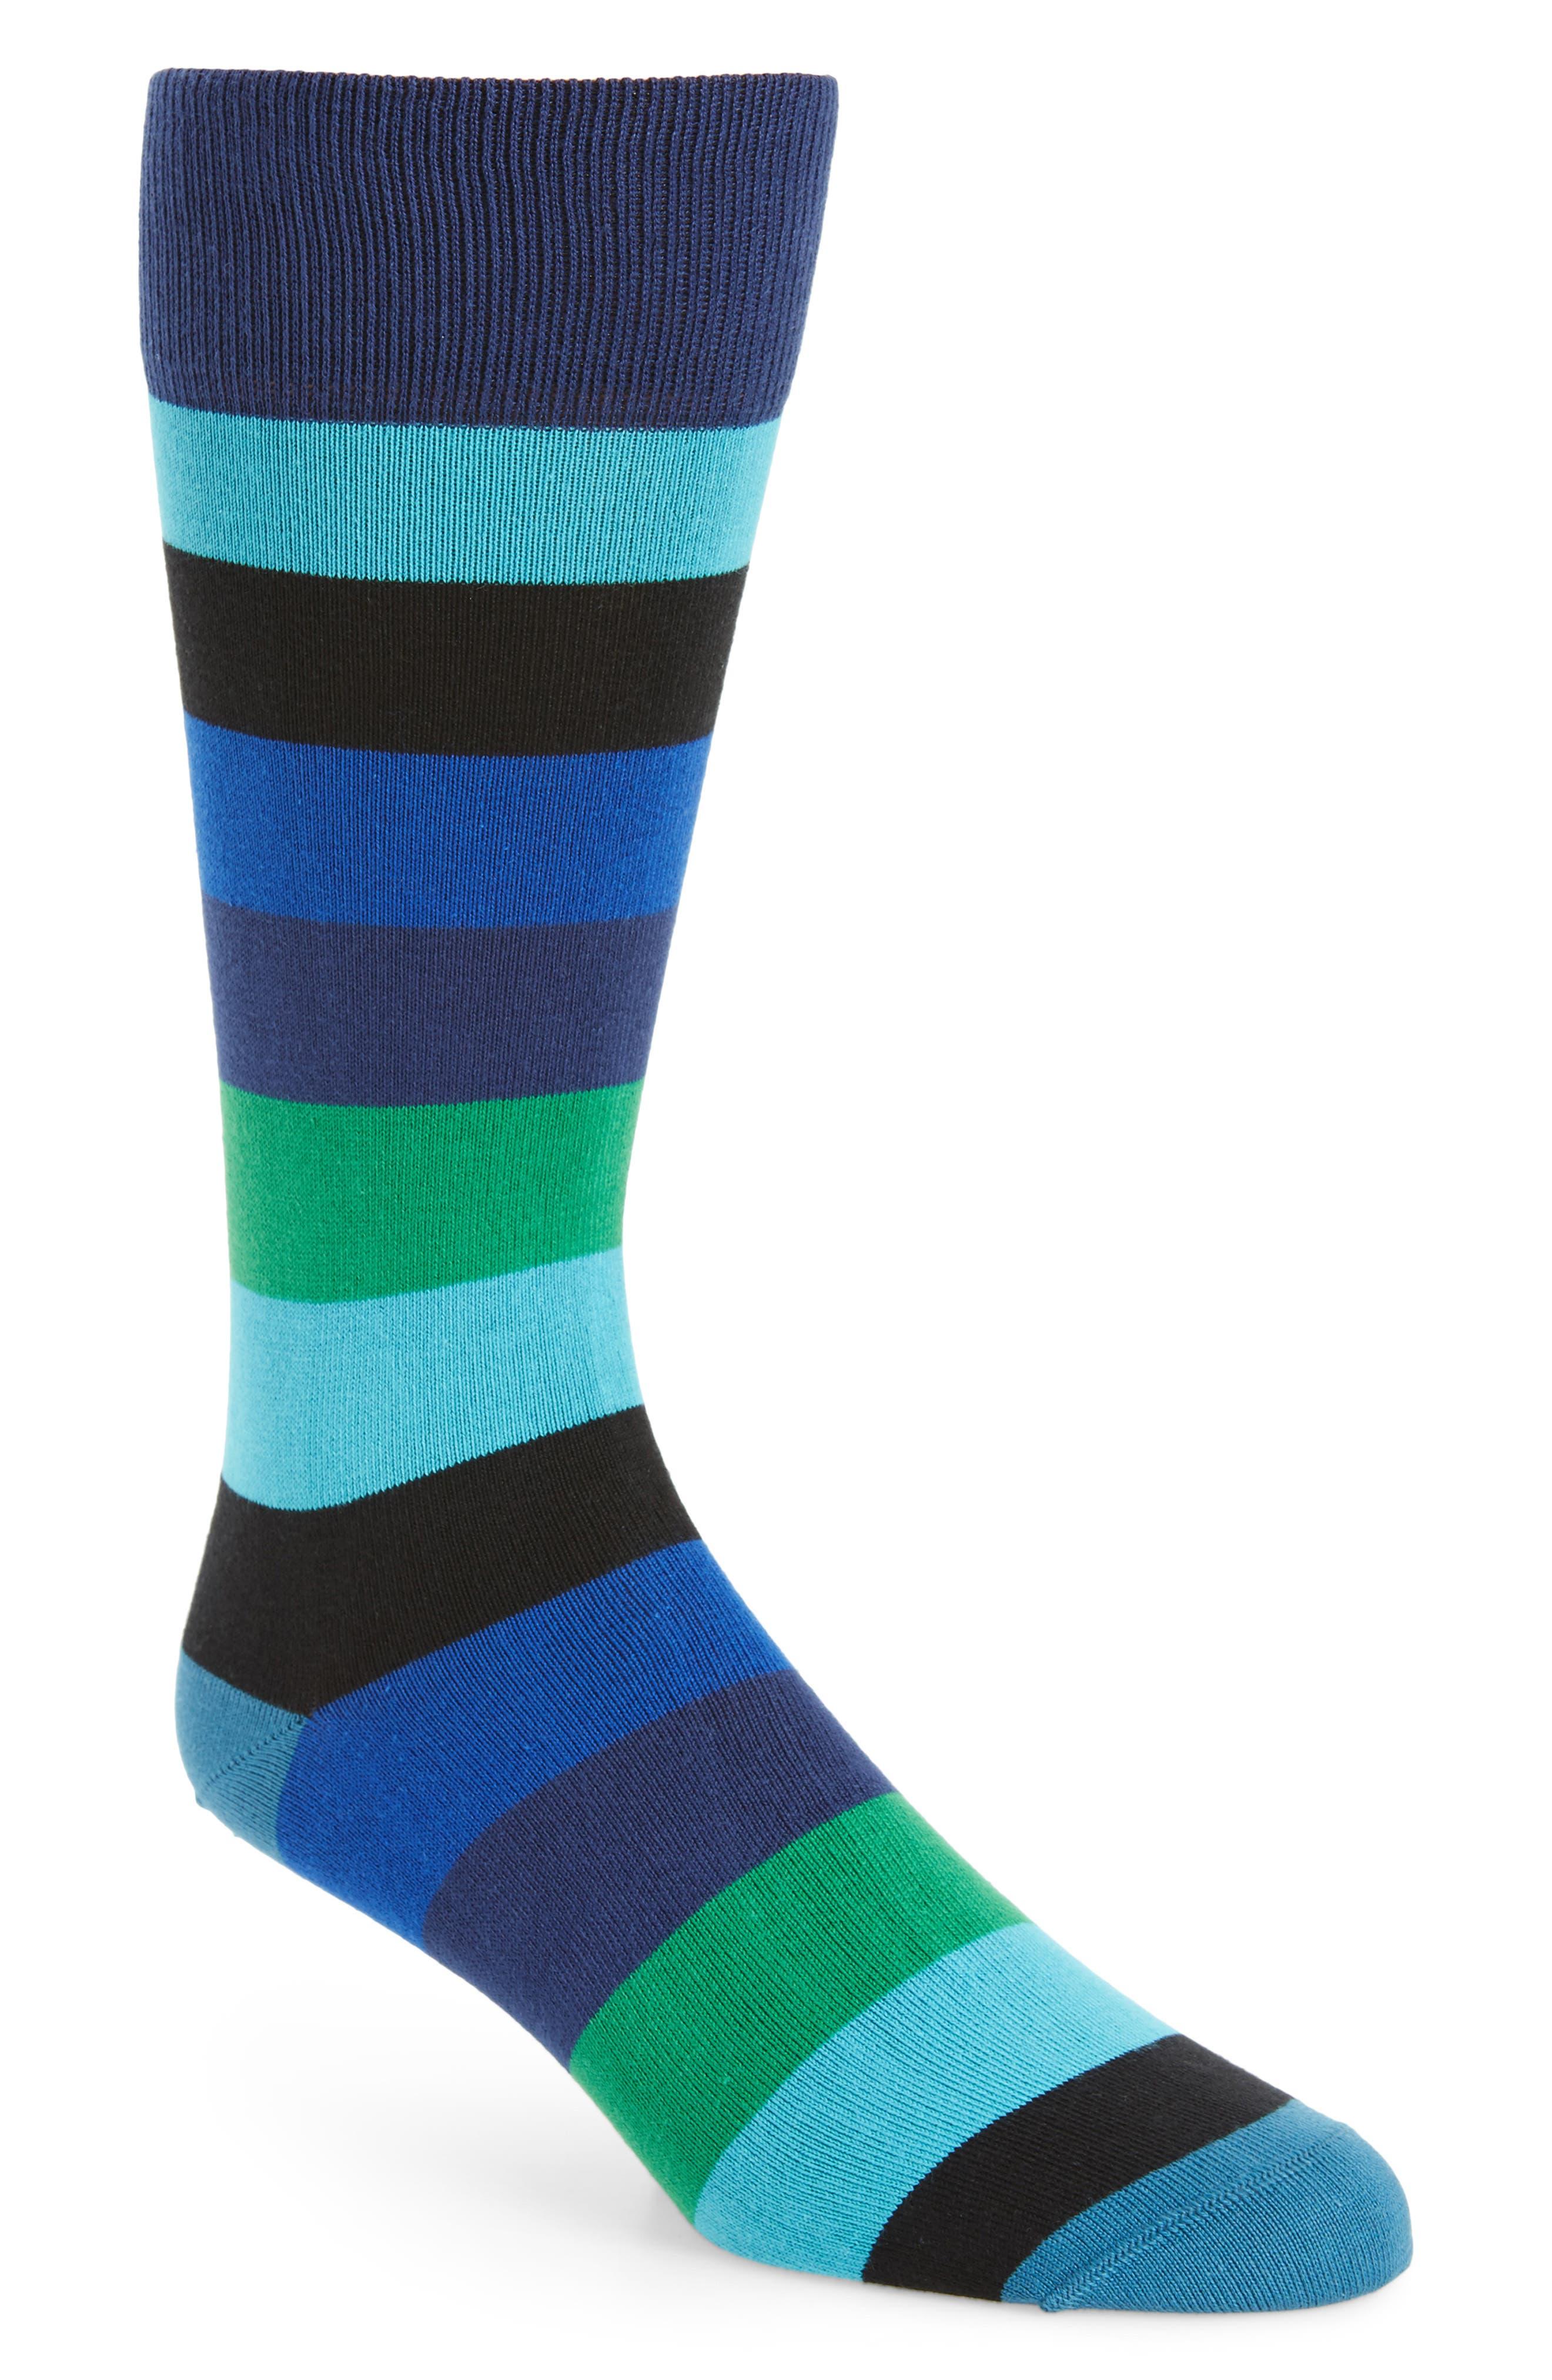 Paul Smith Buxton Stripe Socks